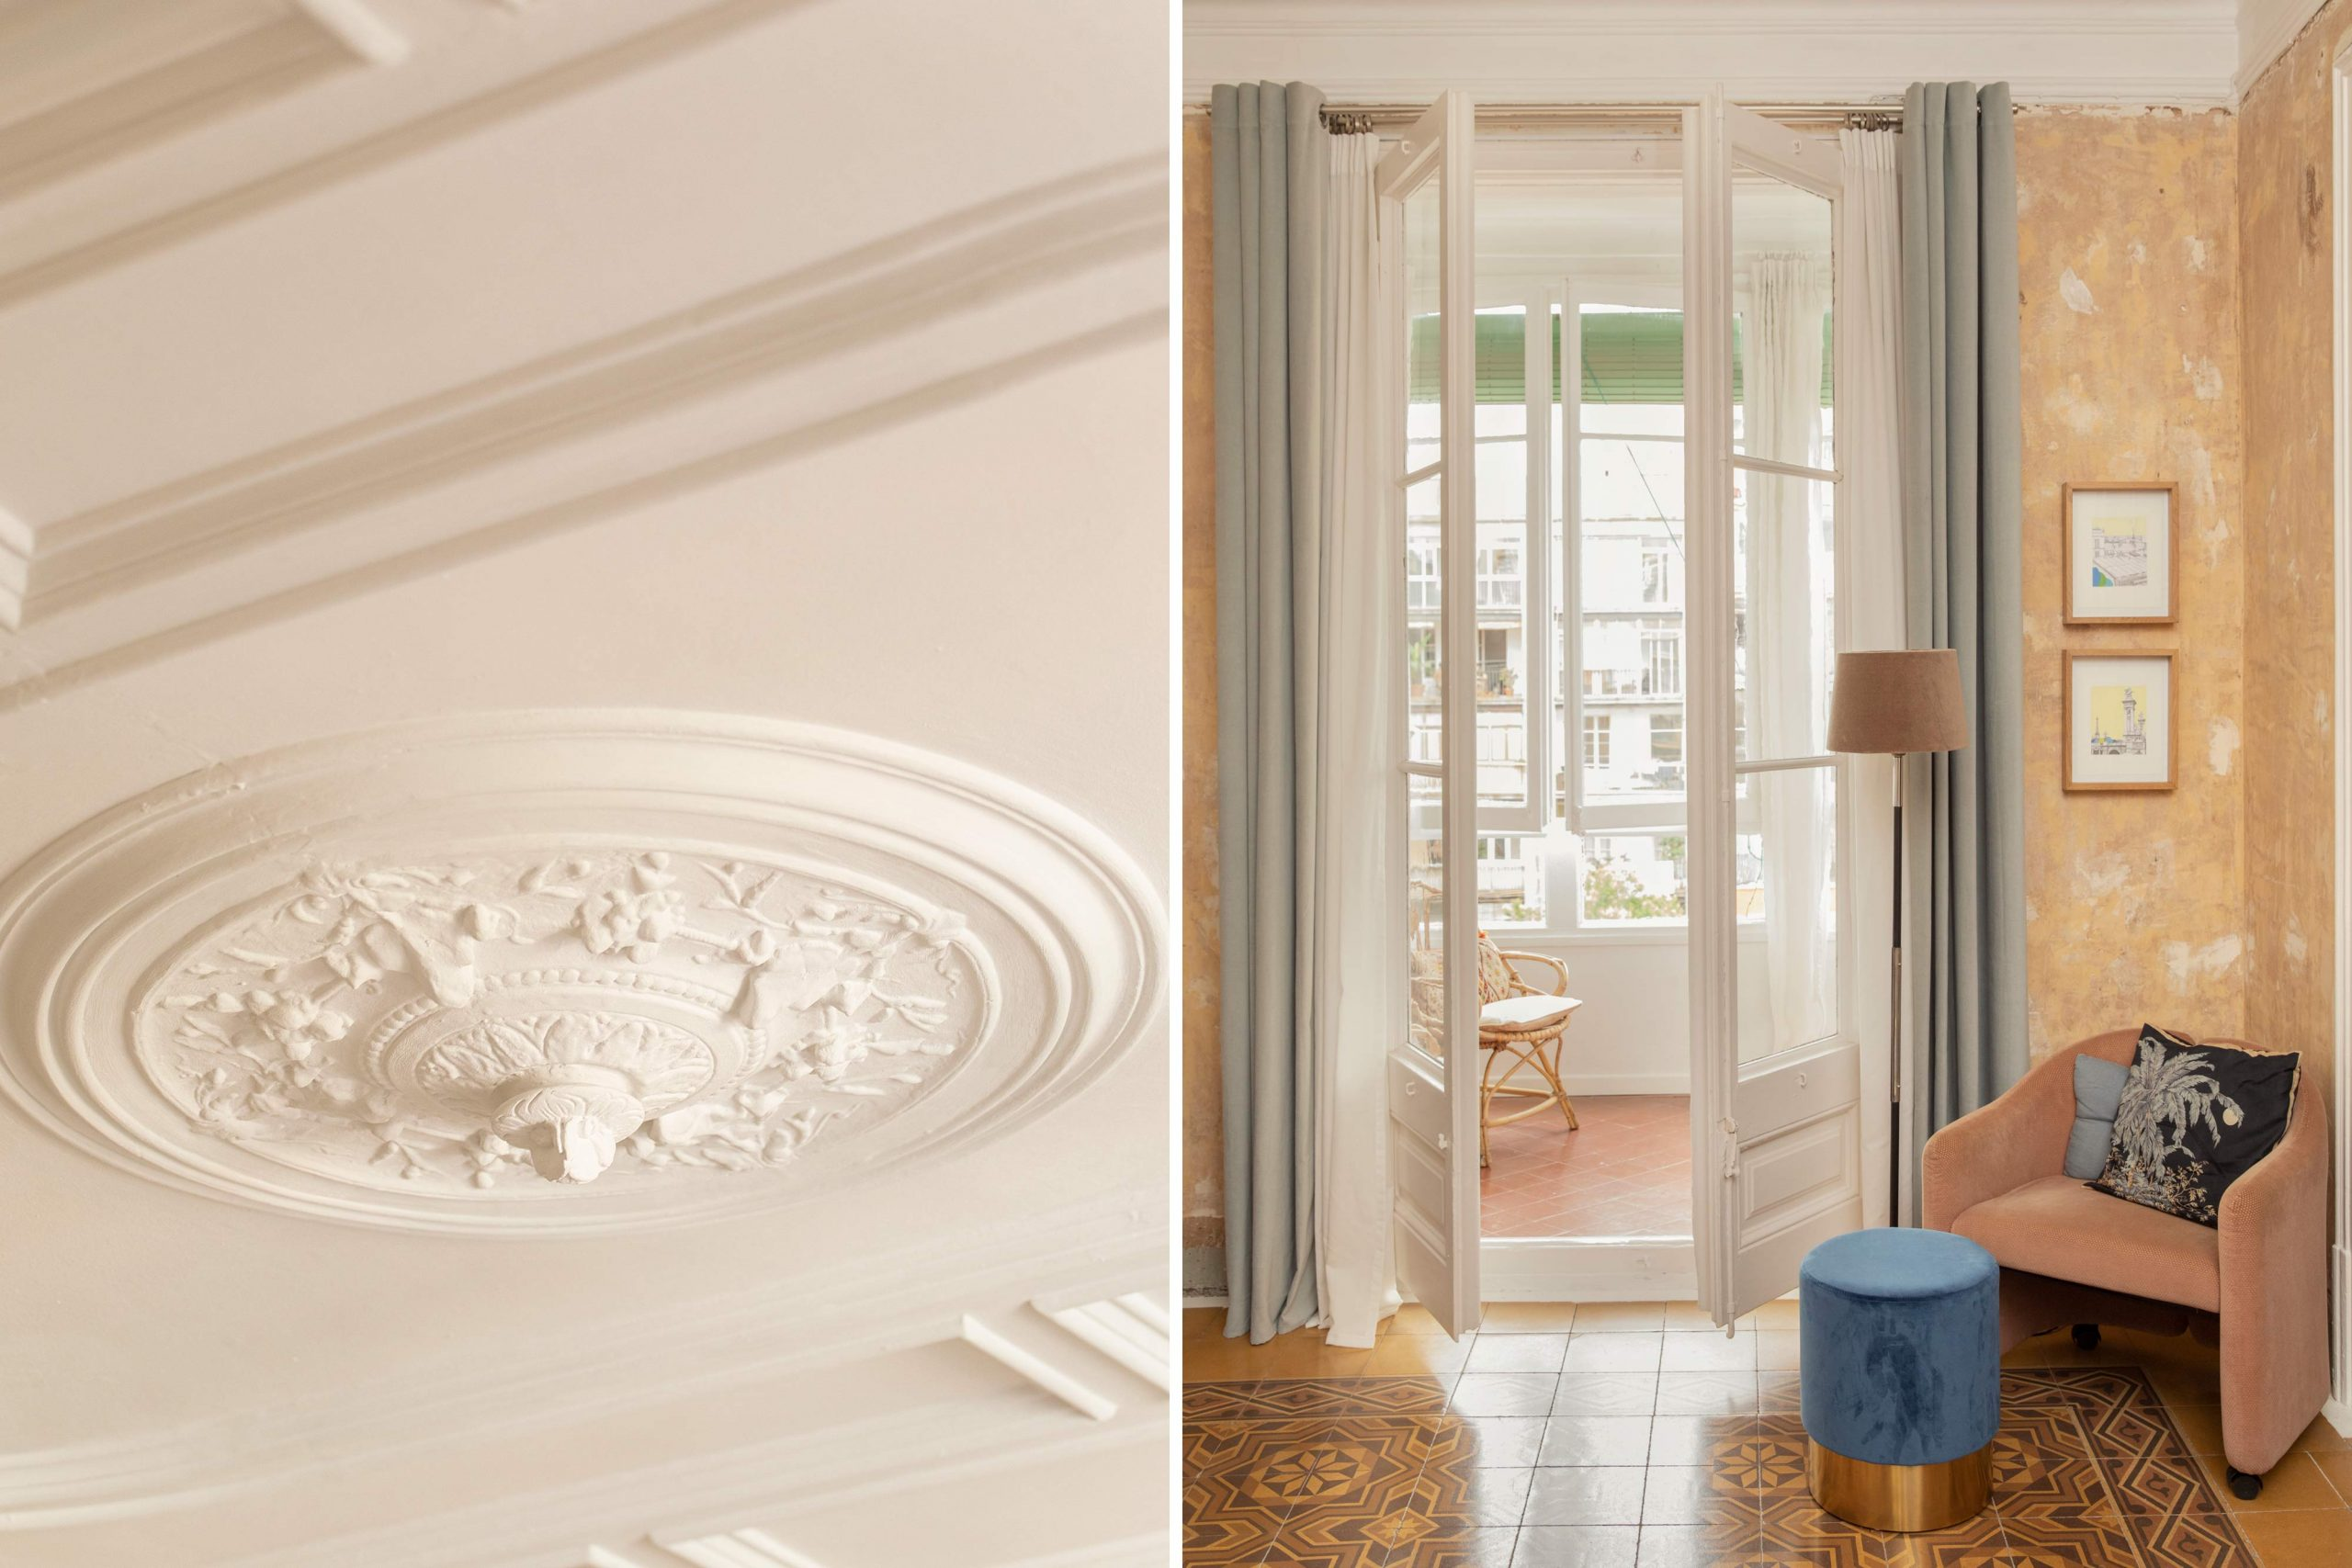 5fotografo-de-interiores-barcelona-lintrepideAD